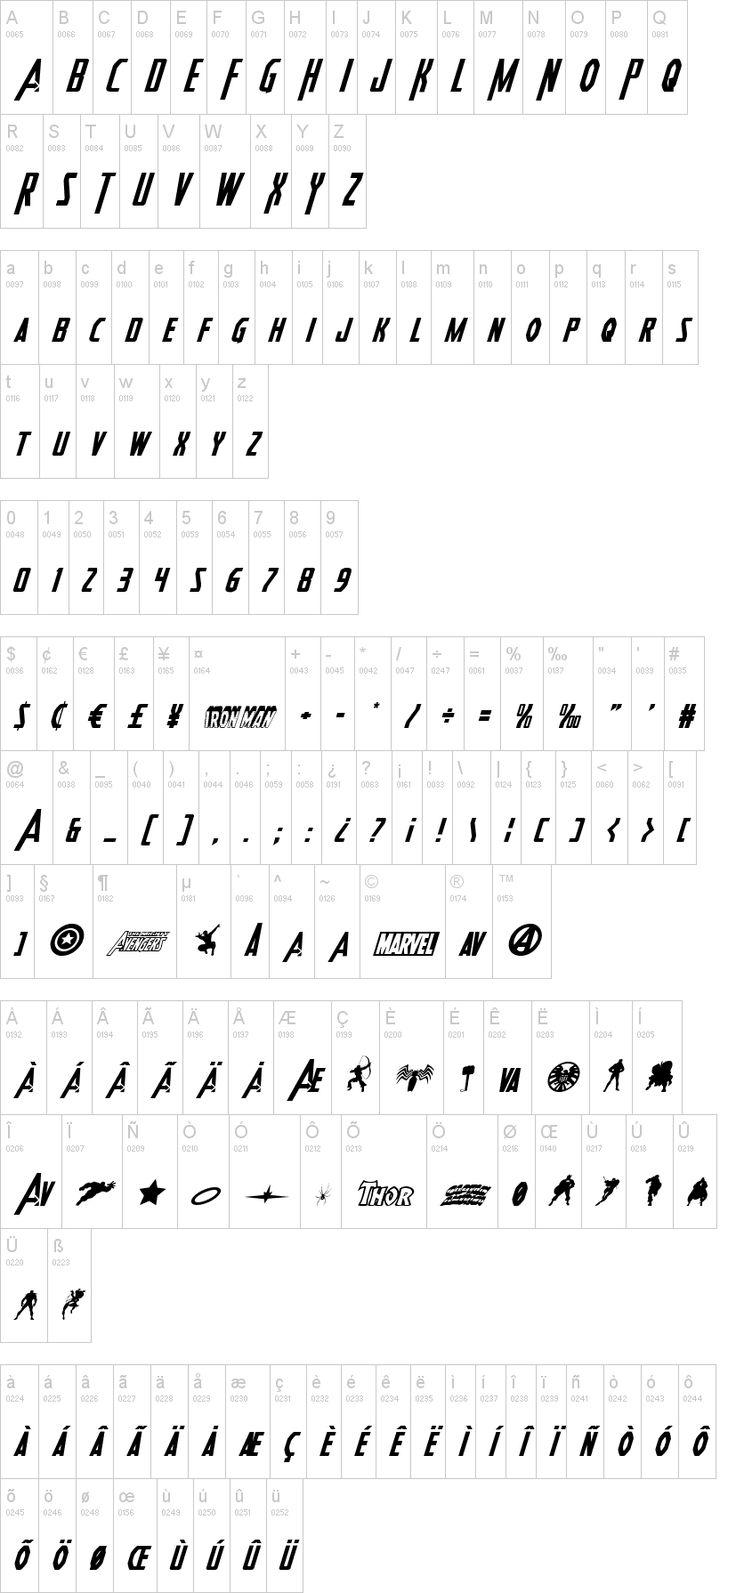 Free Avengers font download